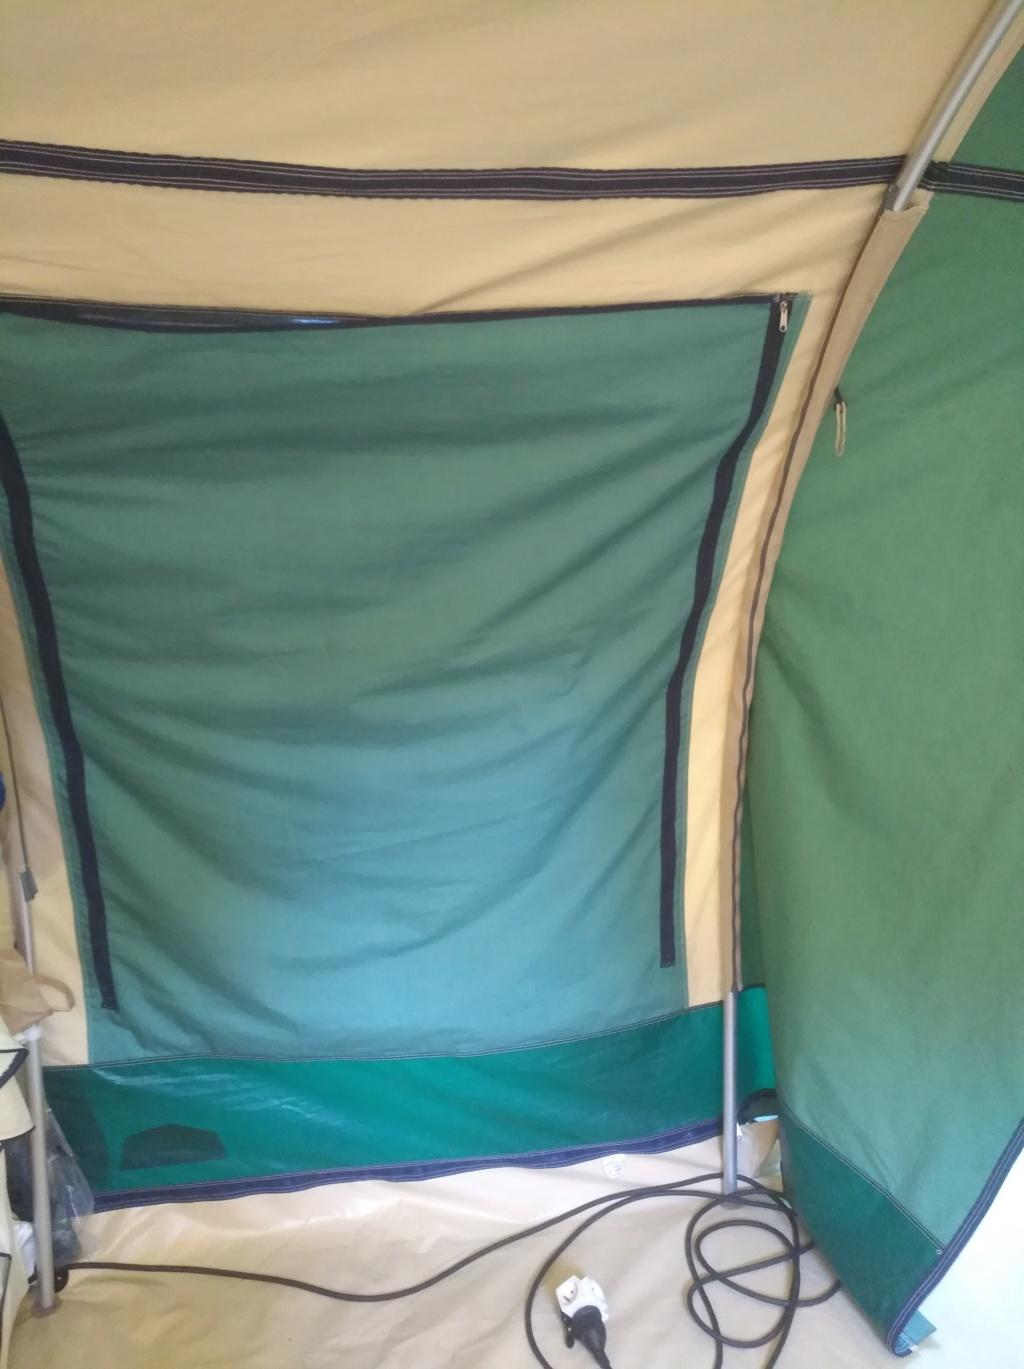 biscaya - tente cabanon biscaya vis-a-vis  Img_2091